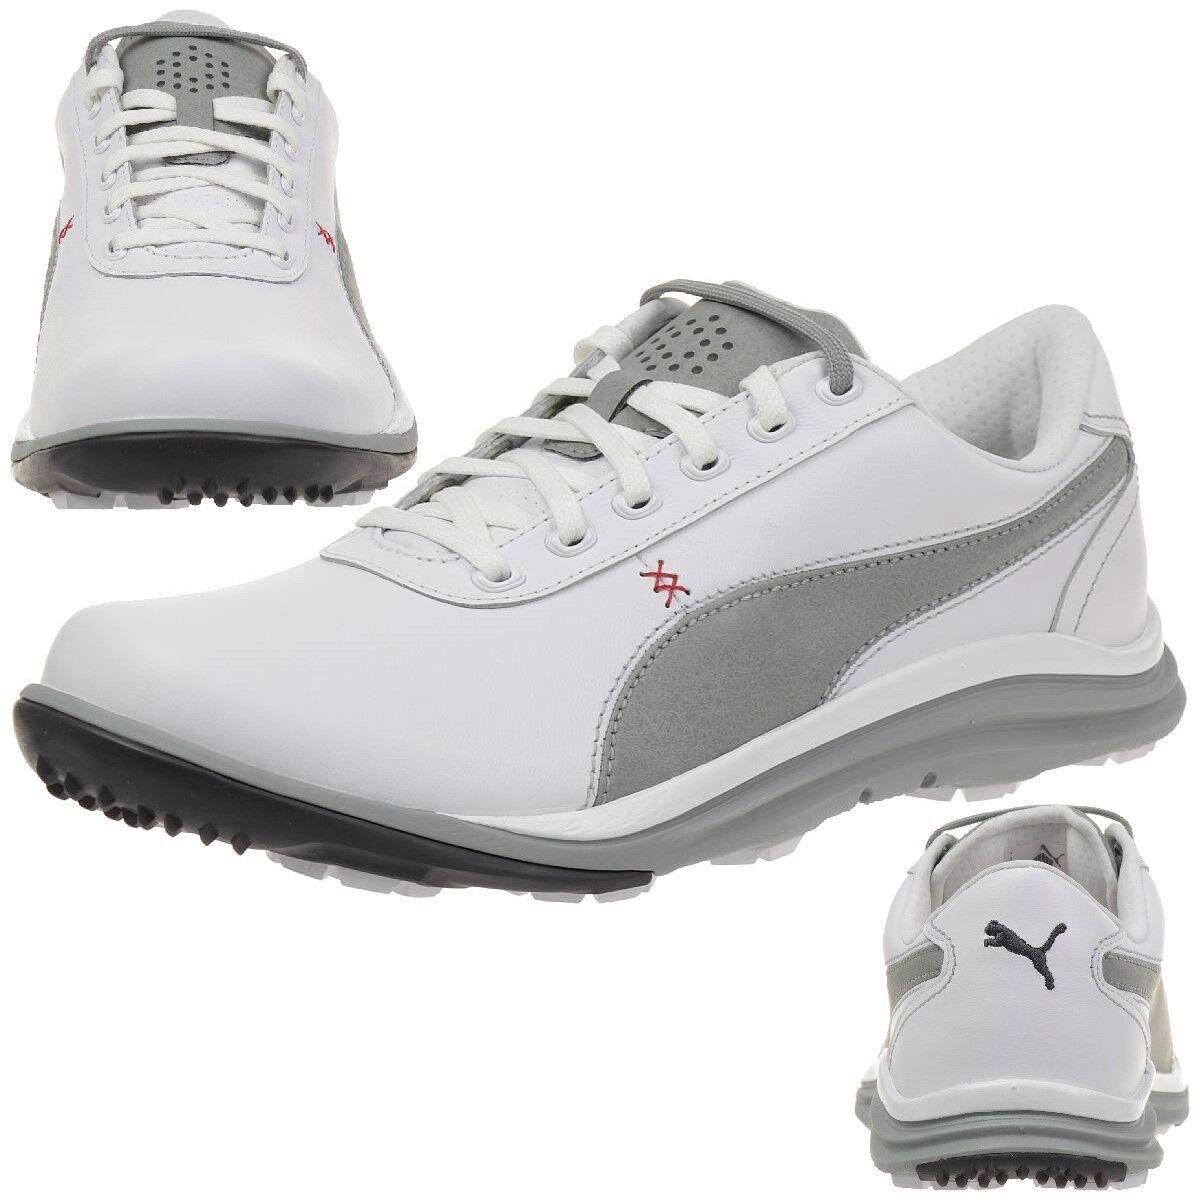 Puma BioDrive Leather Herren Golfschuhe Golf 188337 02 white